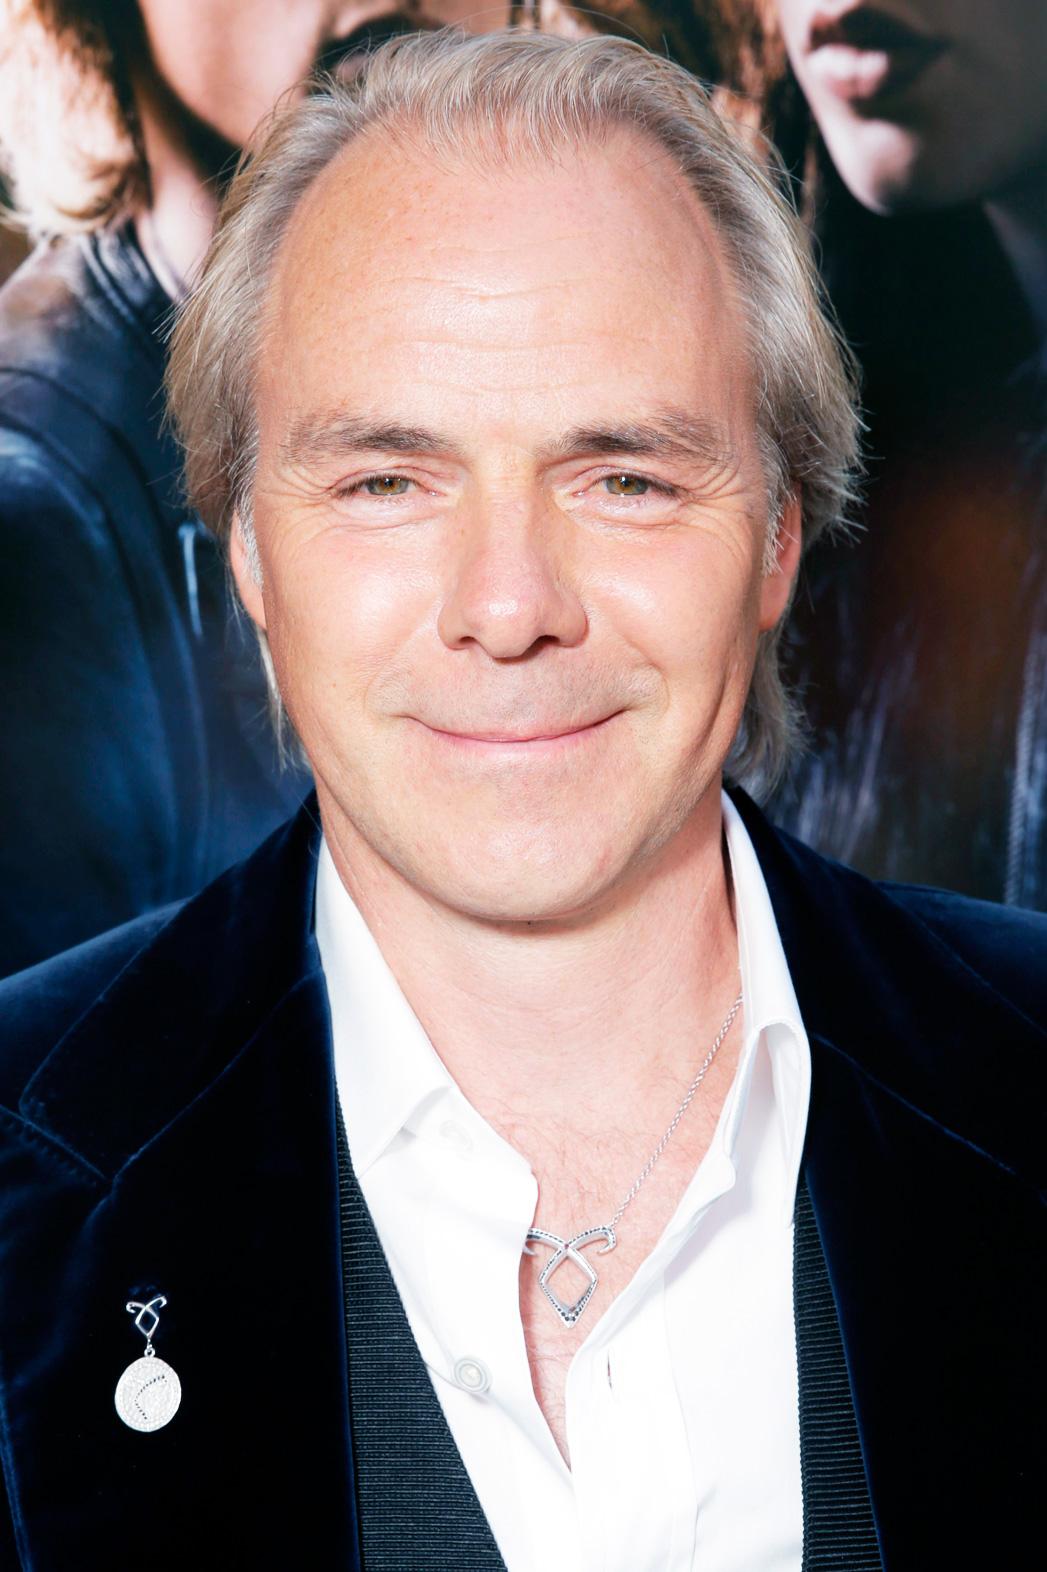 Harald Zwart The Mortal Instruments Premiere Arrival - P 2015